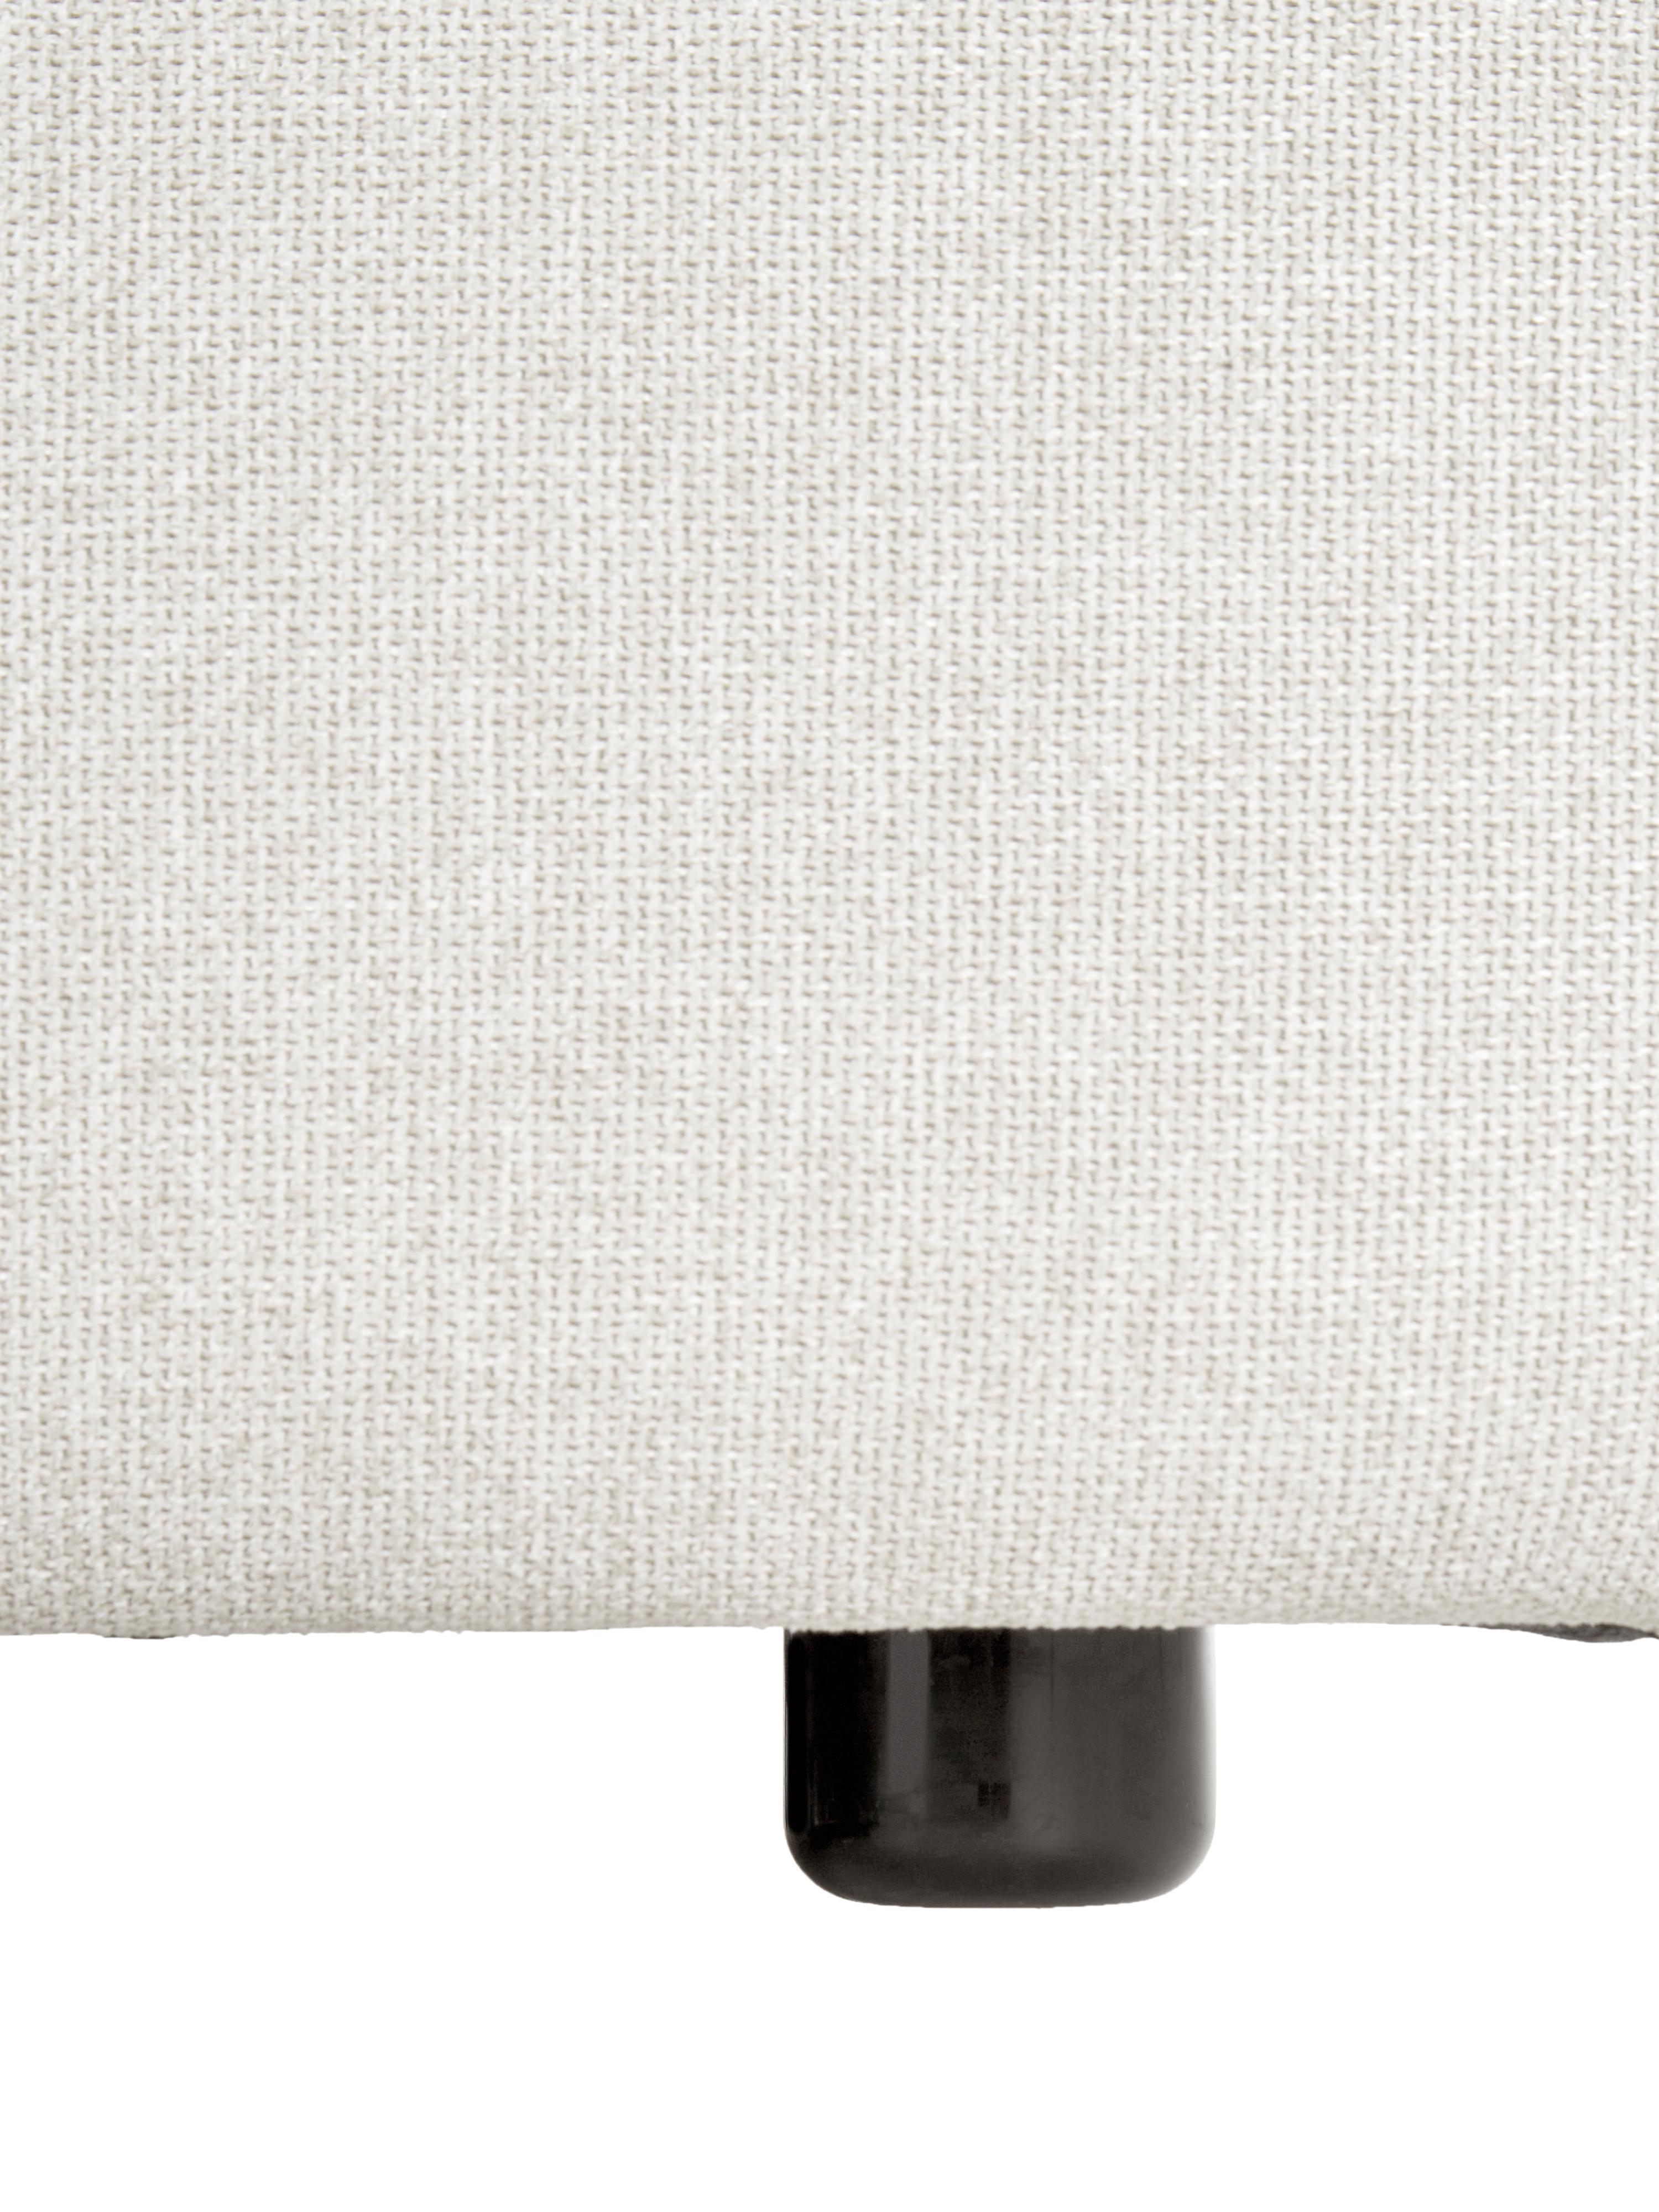 Modulares Ecksofa Lennon, Bezug: Polyester Der hochwertige, Gestell: Massives Kiefernholz, Spe, Füße: Kunststoff, Webstoff Beige, B 238 x T 180 cm